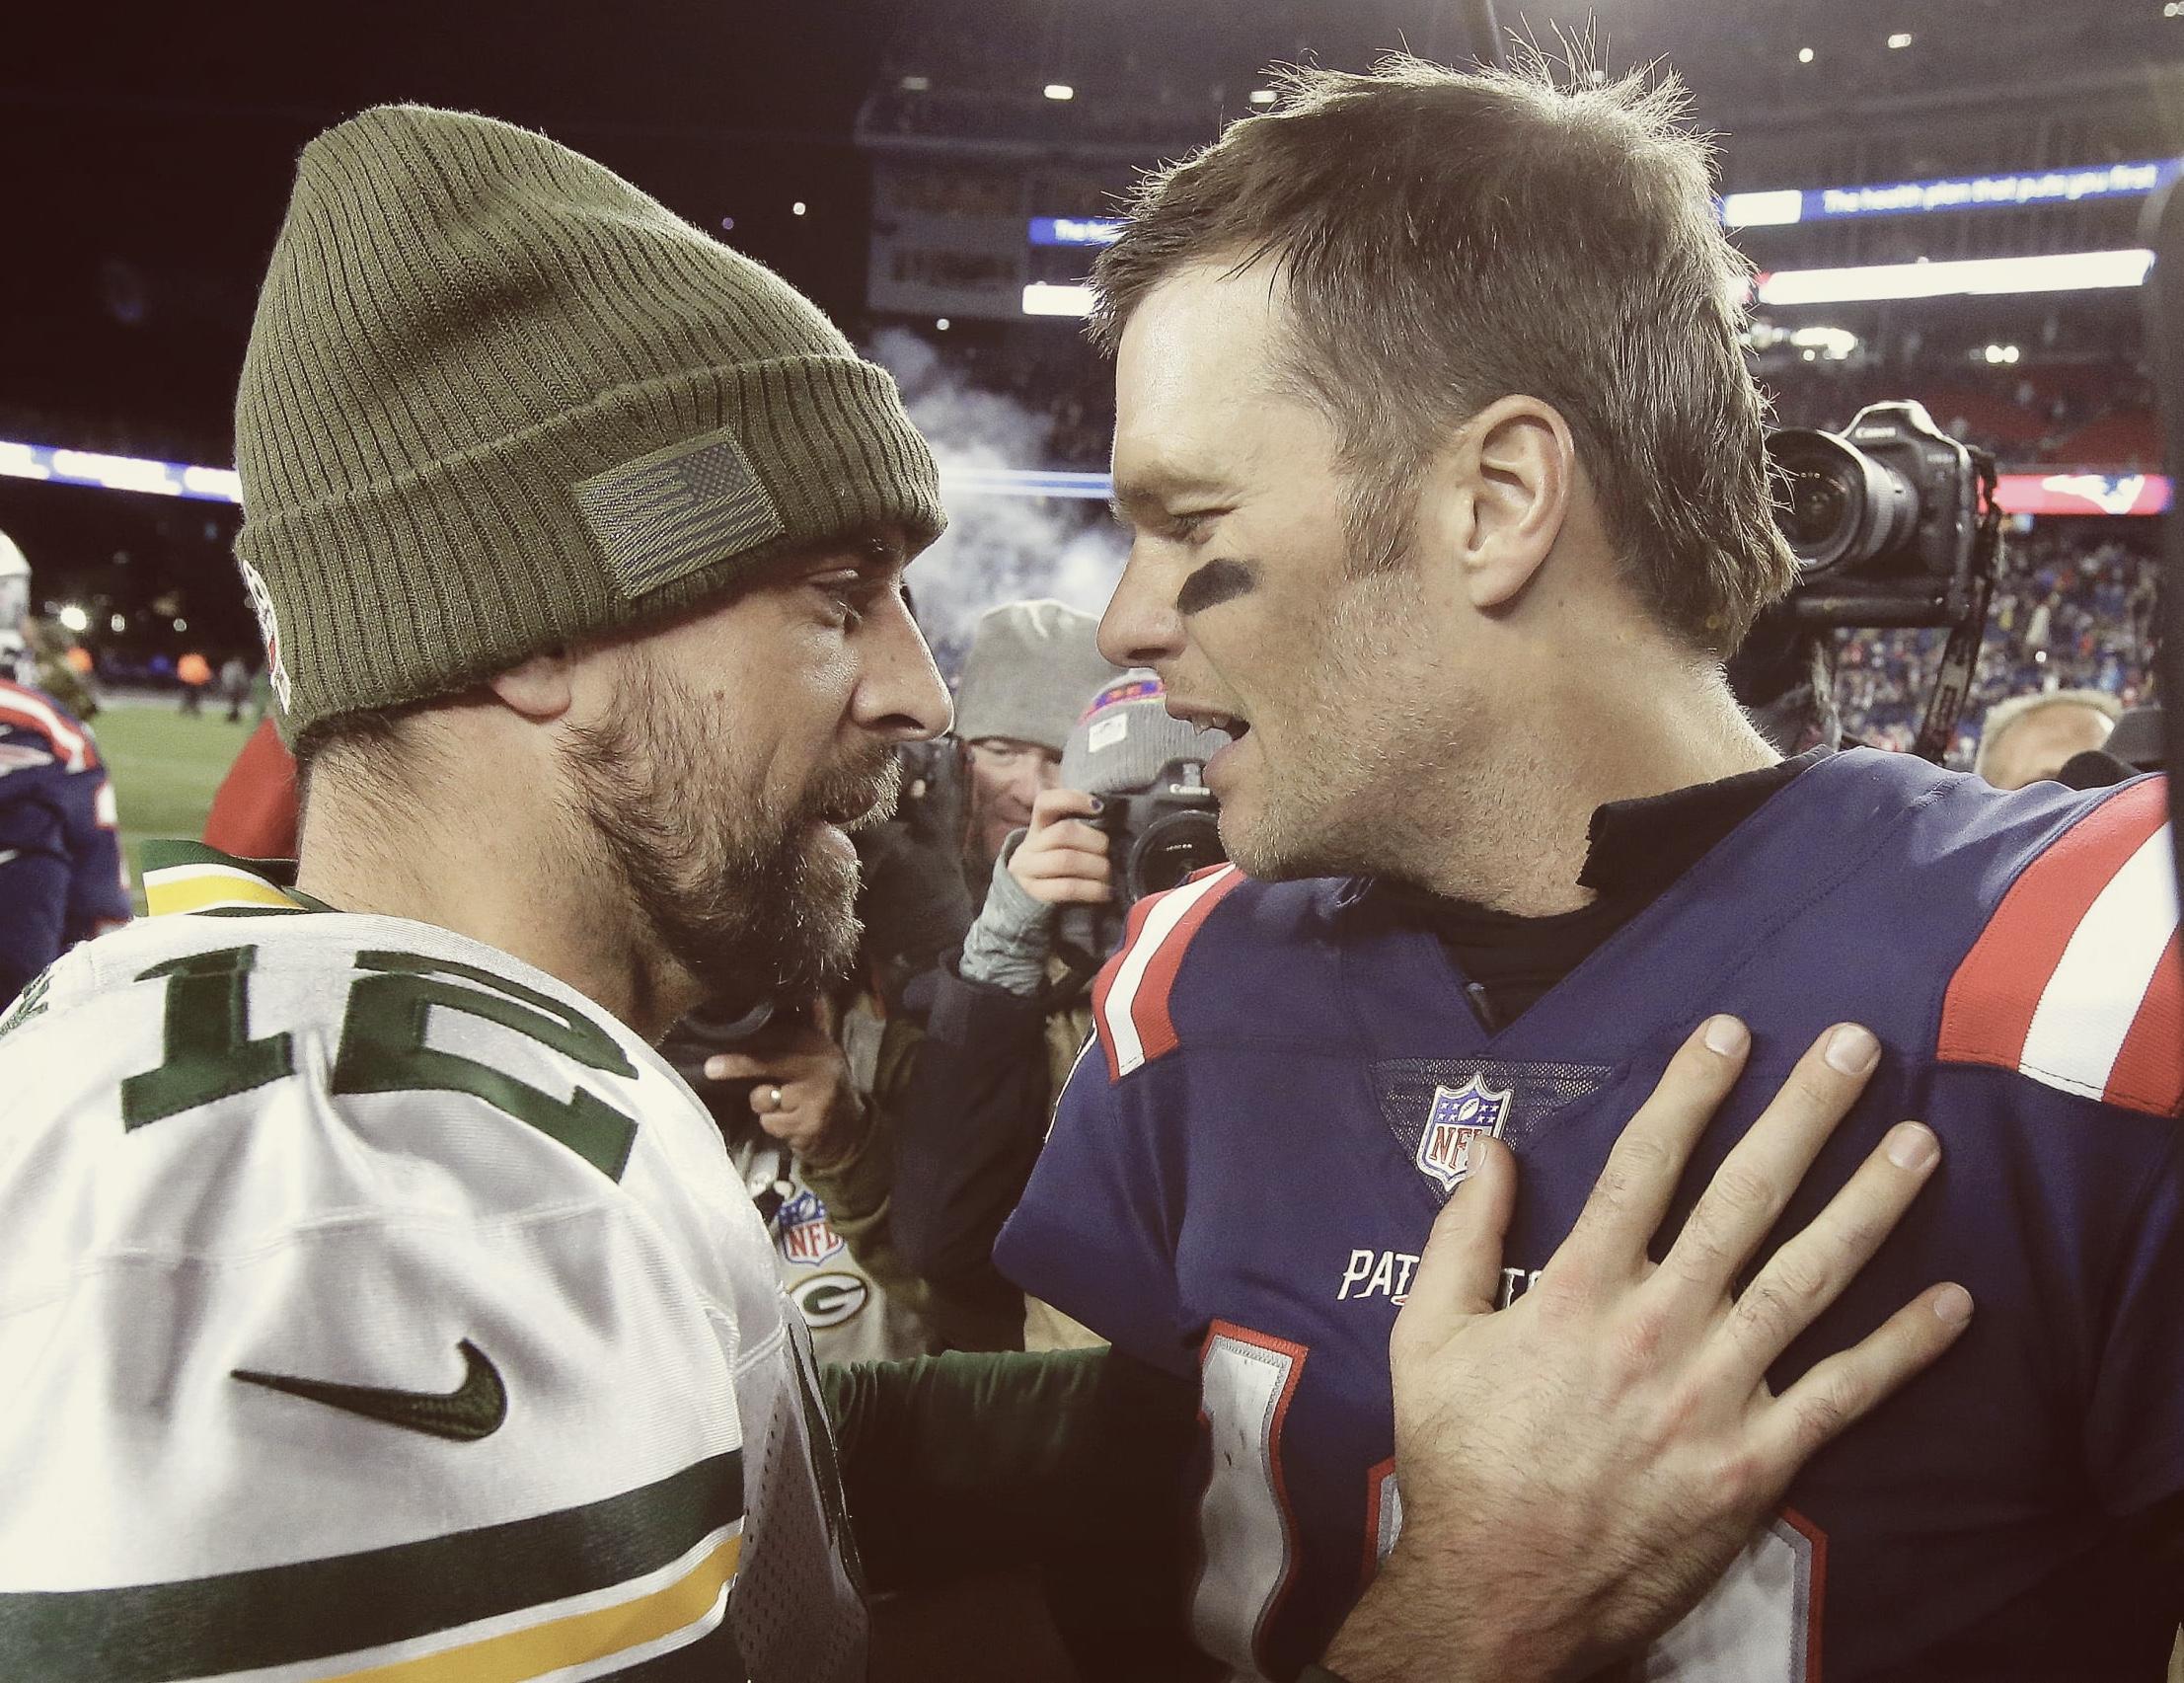 Via:   Steve Senne/AP Images/Patriots.com